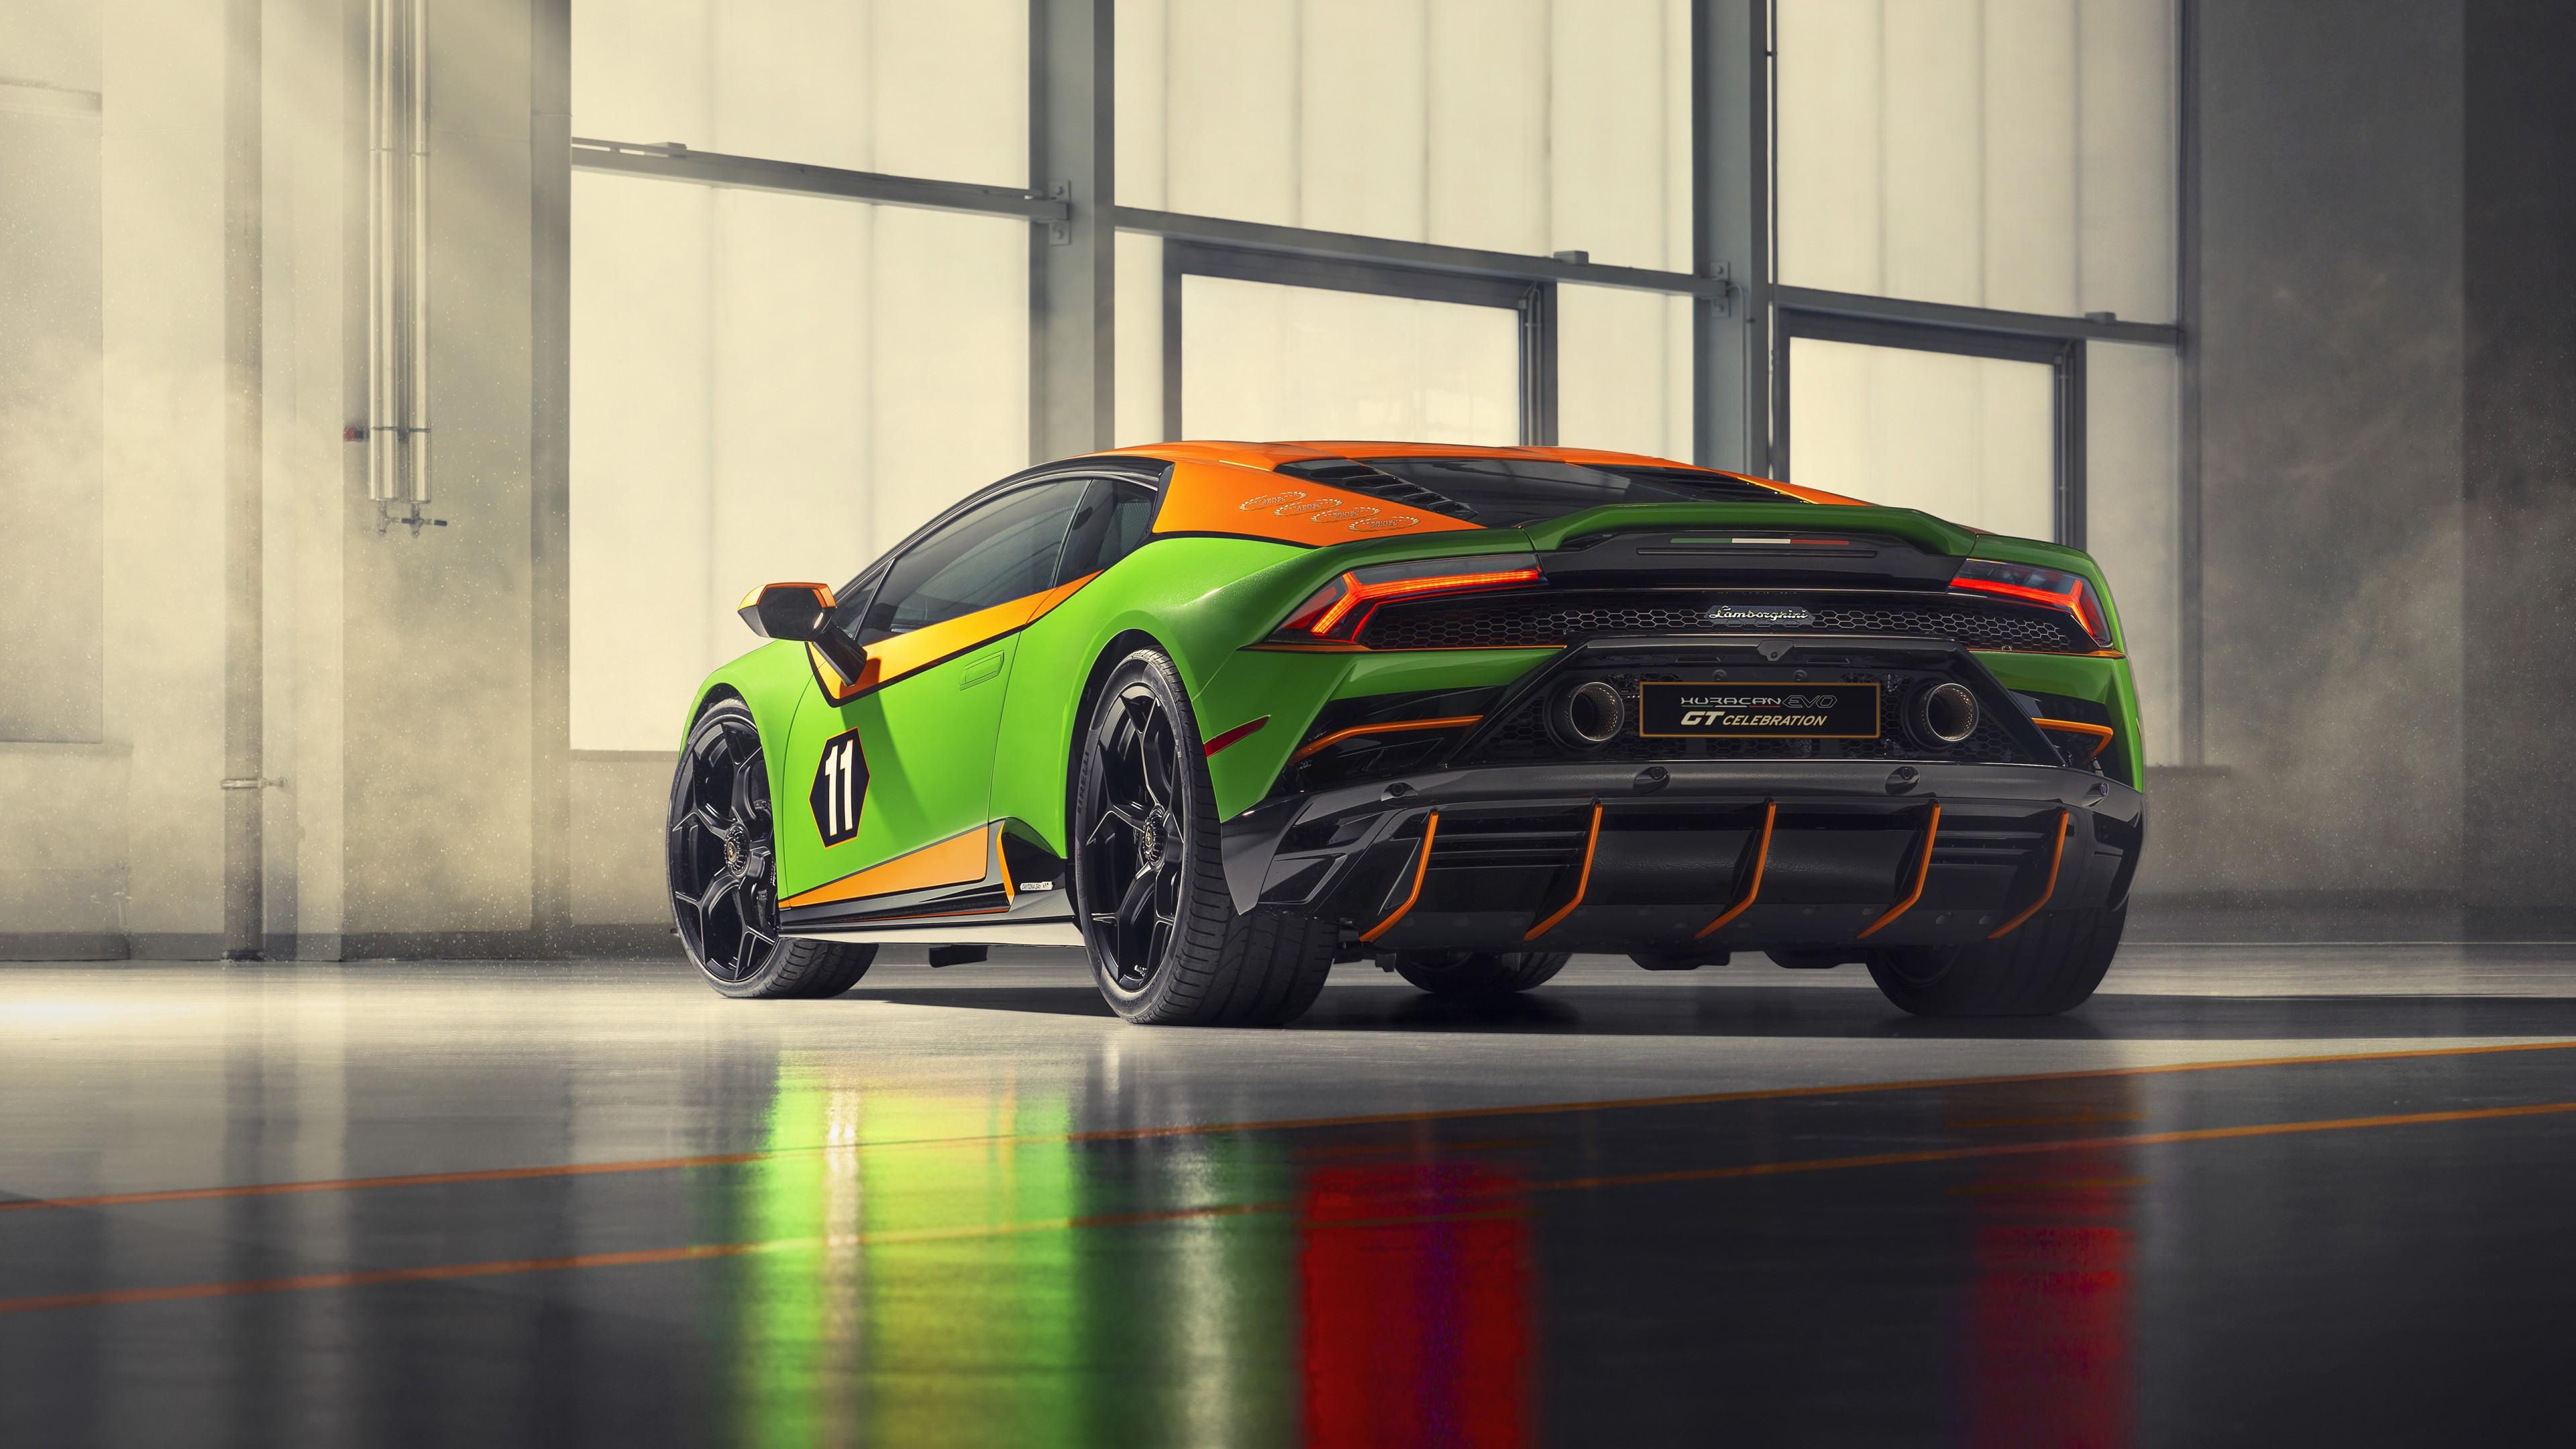 2020 Lamborghini Huracan EVO GT Celebration 4K 2 Wallpaper ...